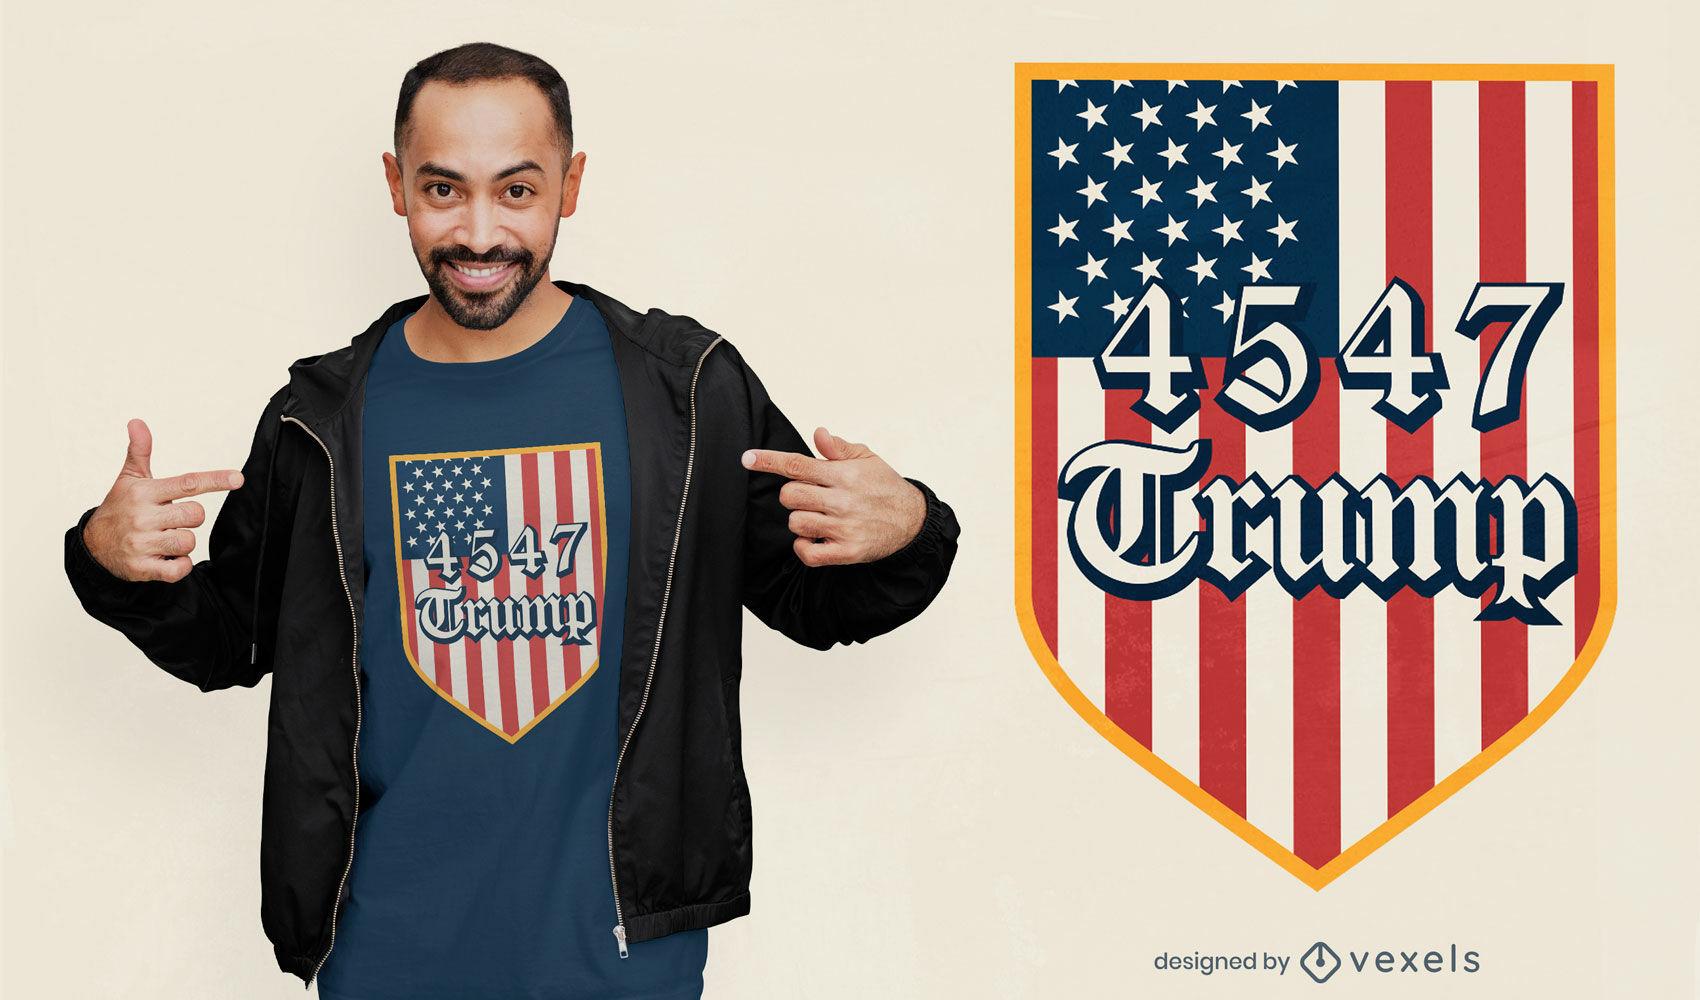 4547 trump t-shirt design